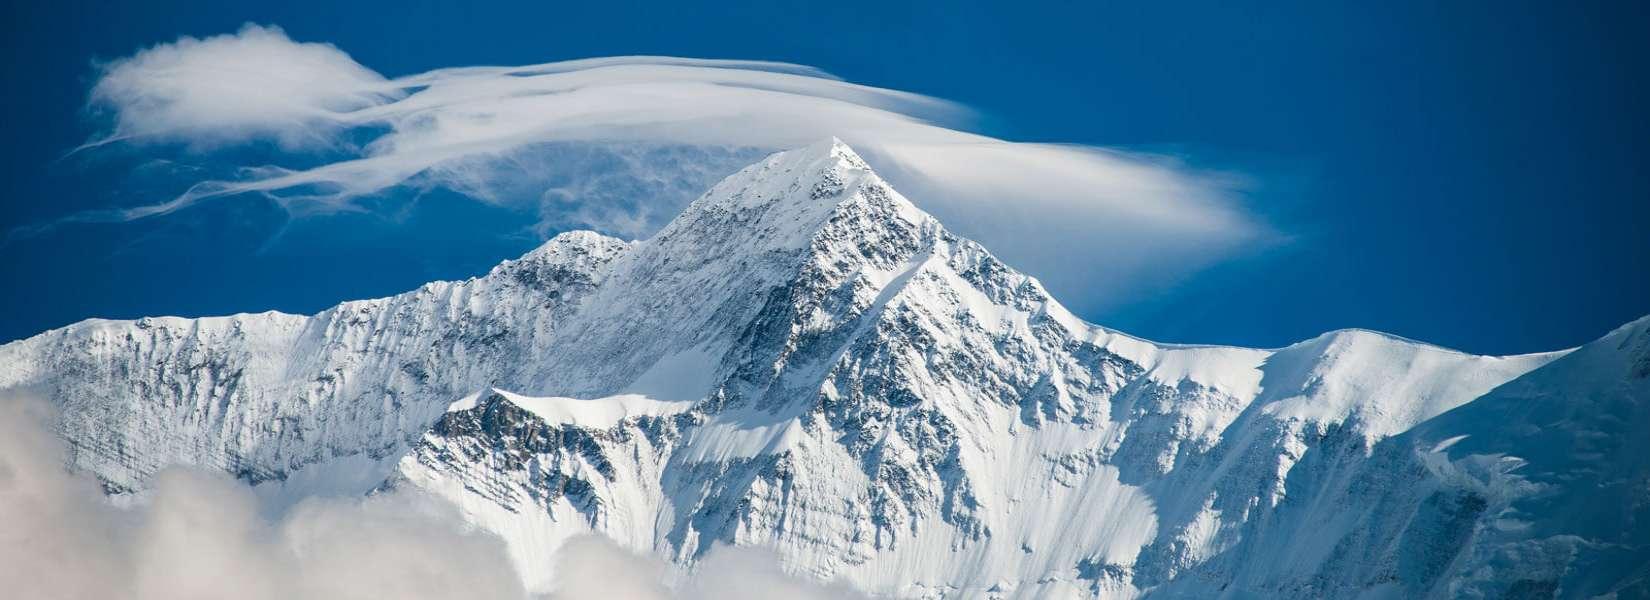 The Himalayas Nepal